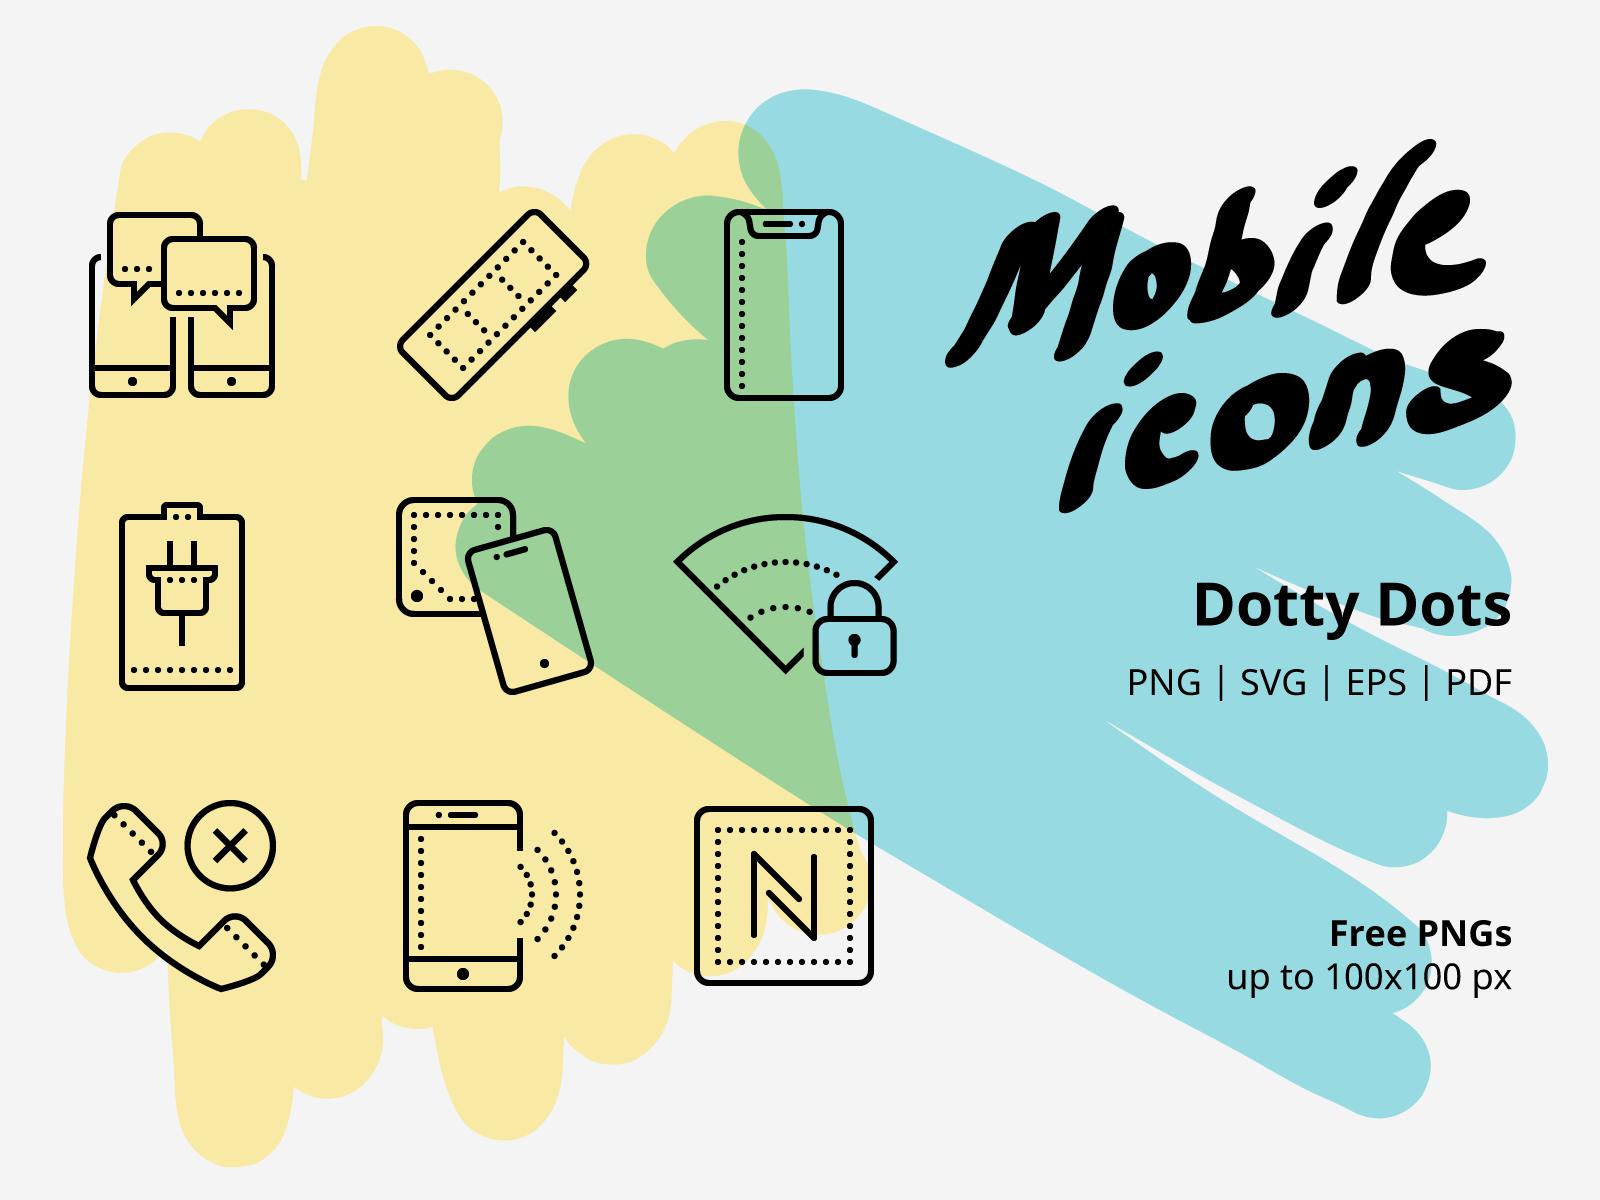 Mobile 4x